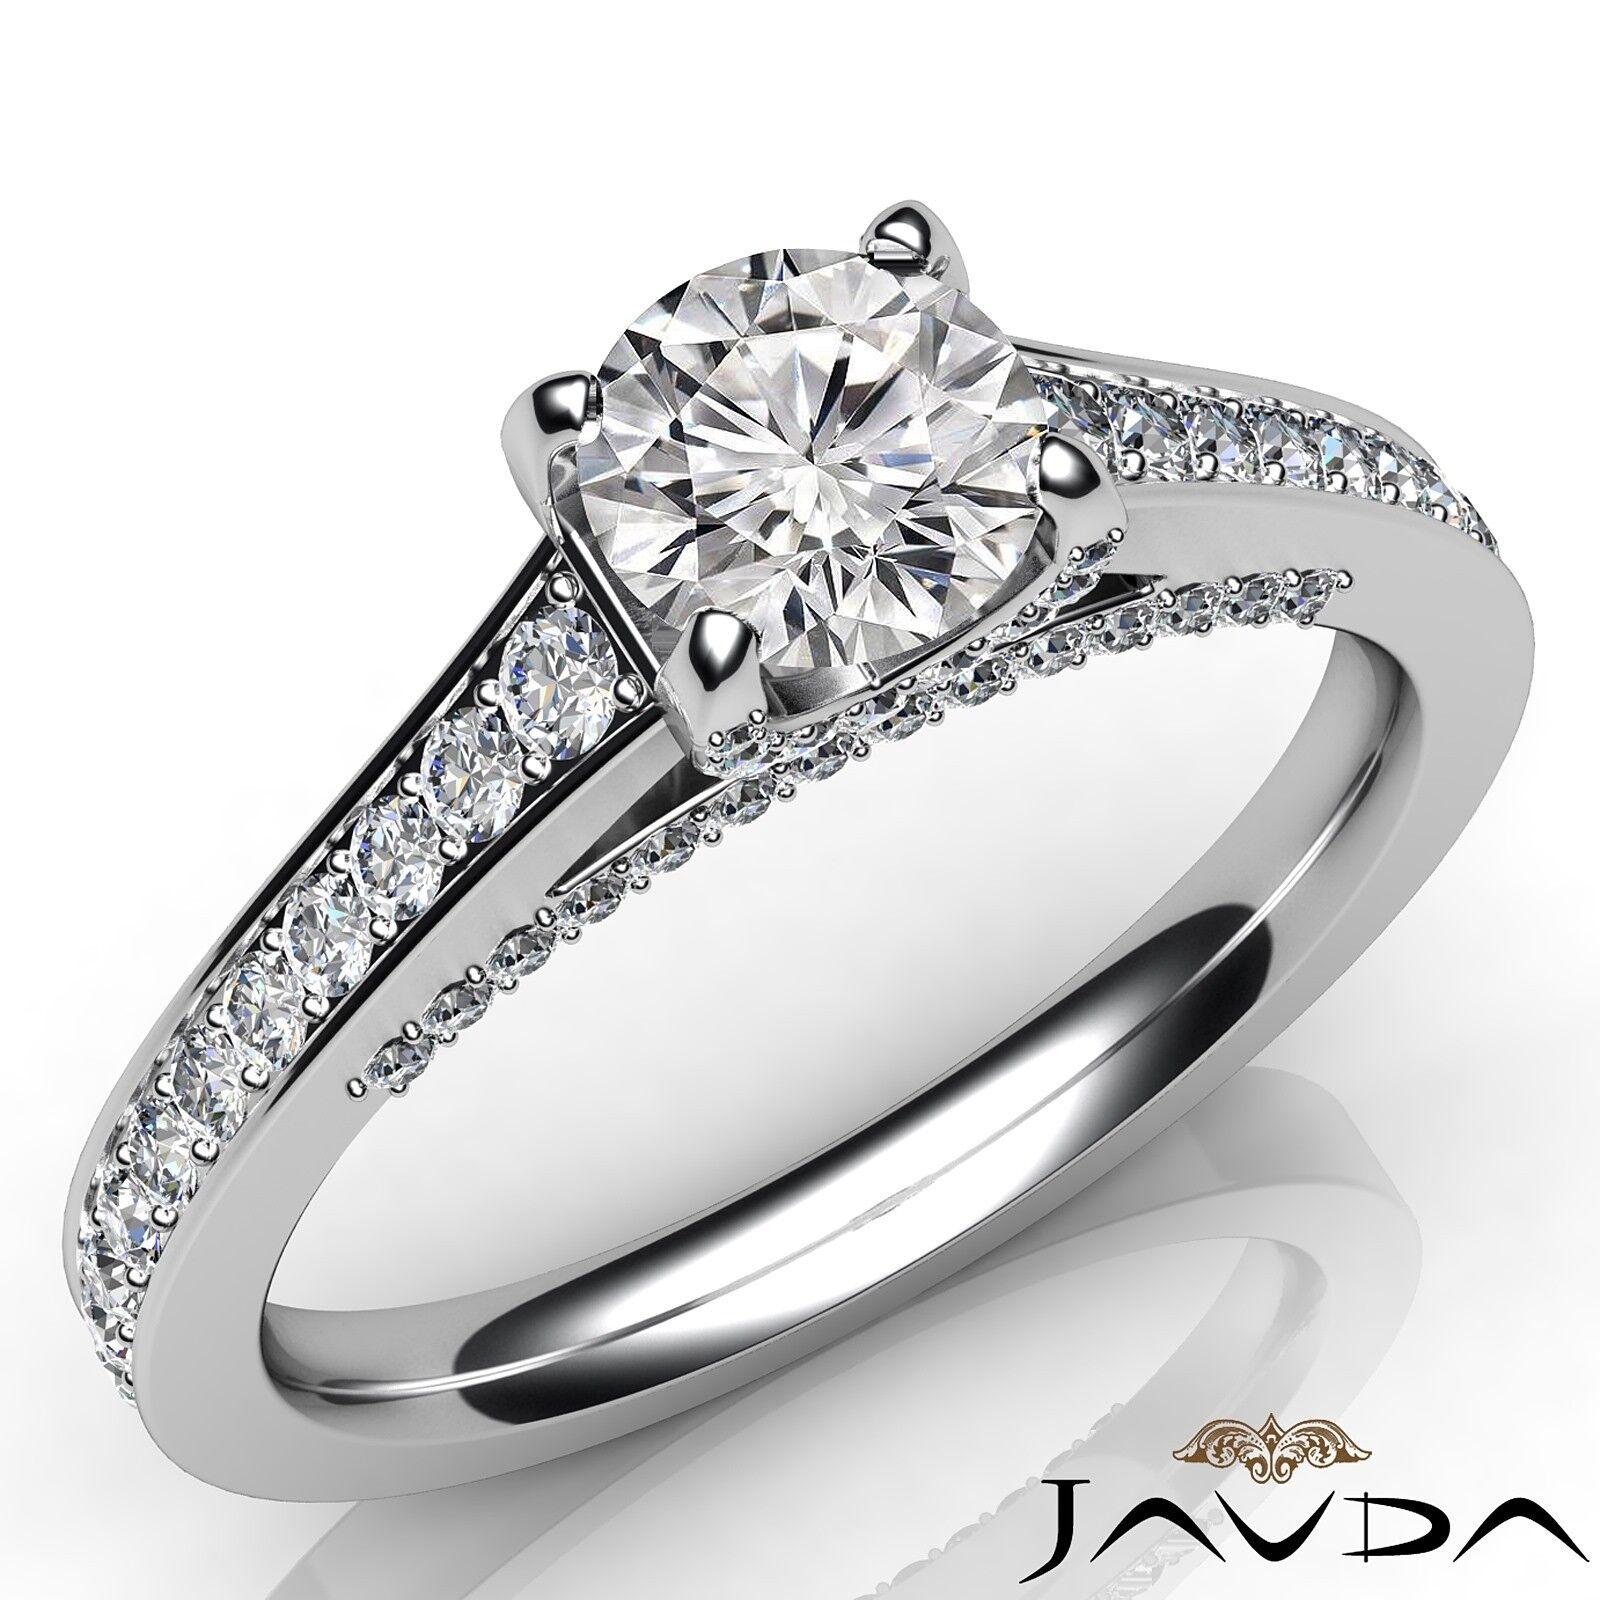 1.45ctw Certified Stone Round Diamond Engagement Ring GIA E-VVS1 White Gold New